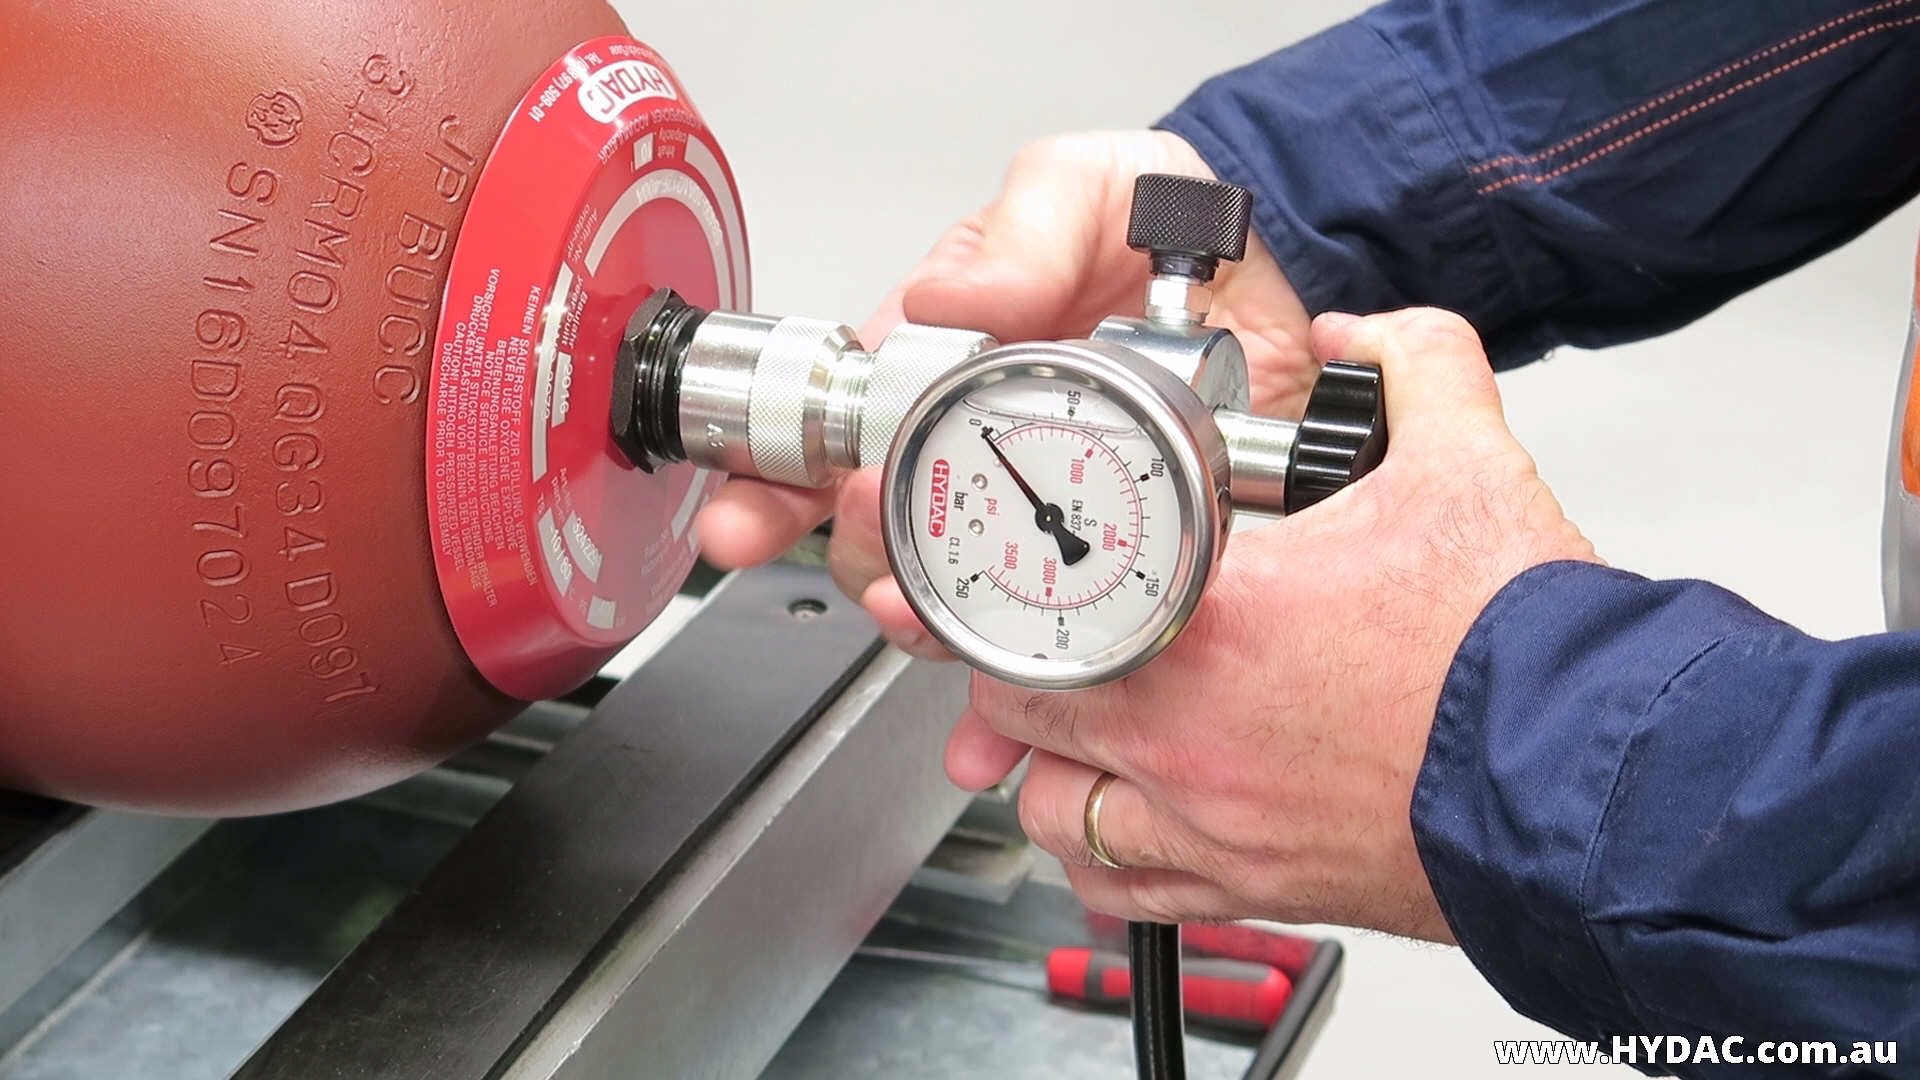 Test and charging HYDAC hydro-pneumatic accumulators